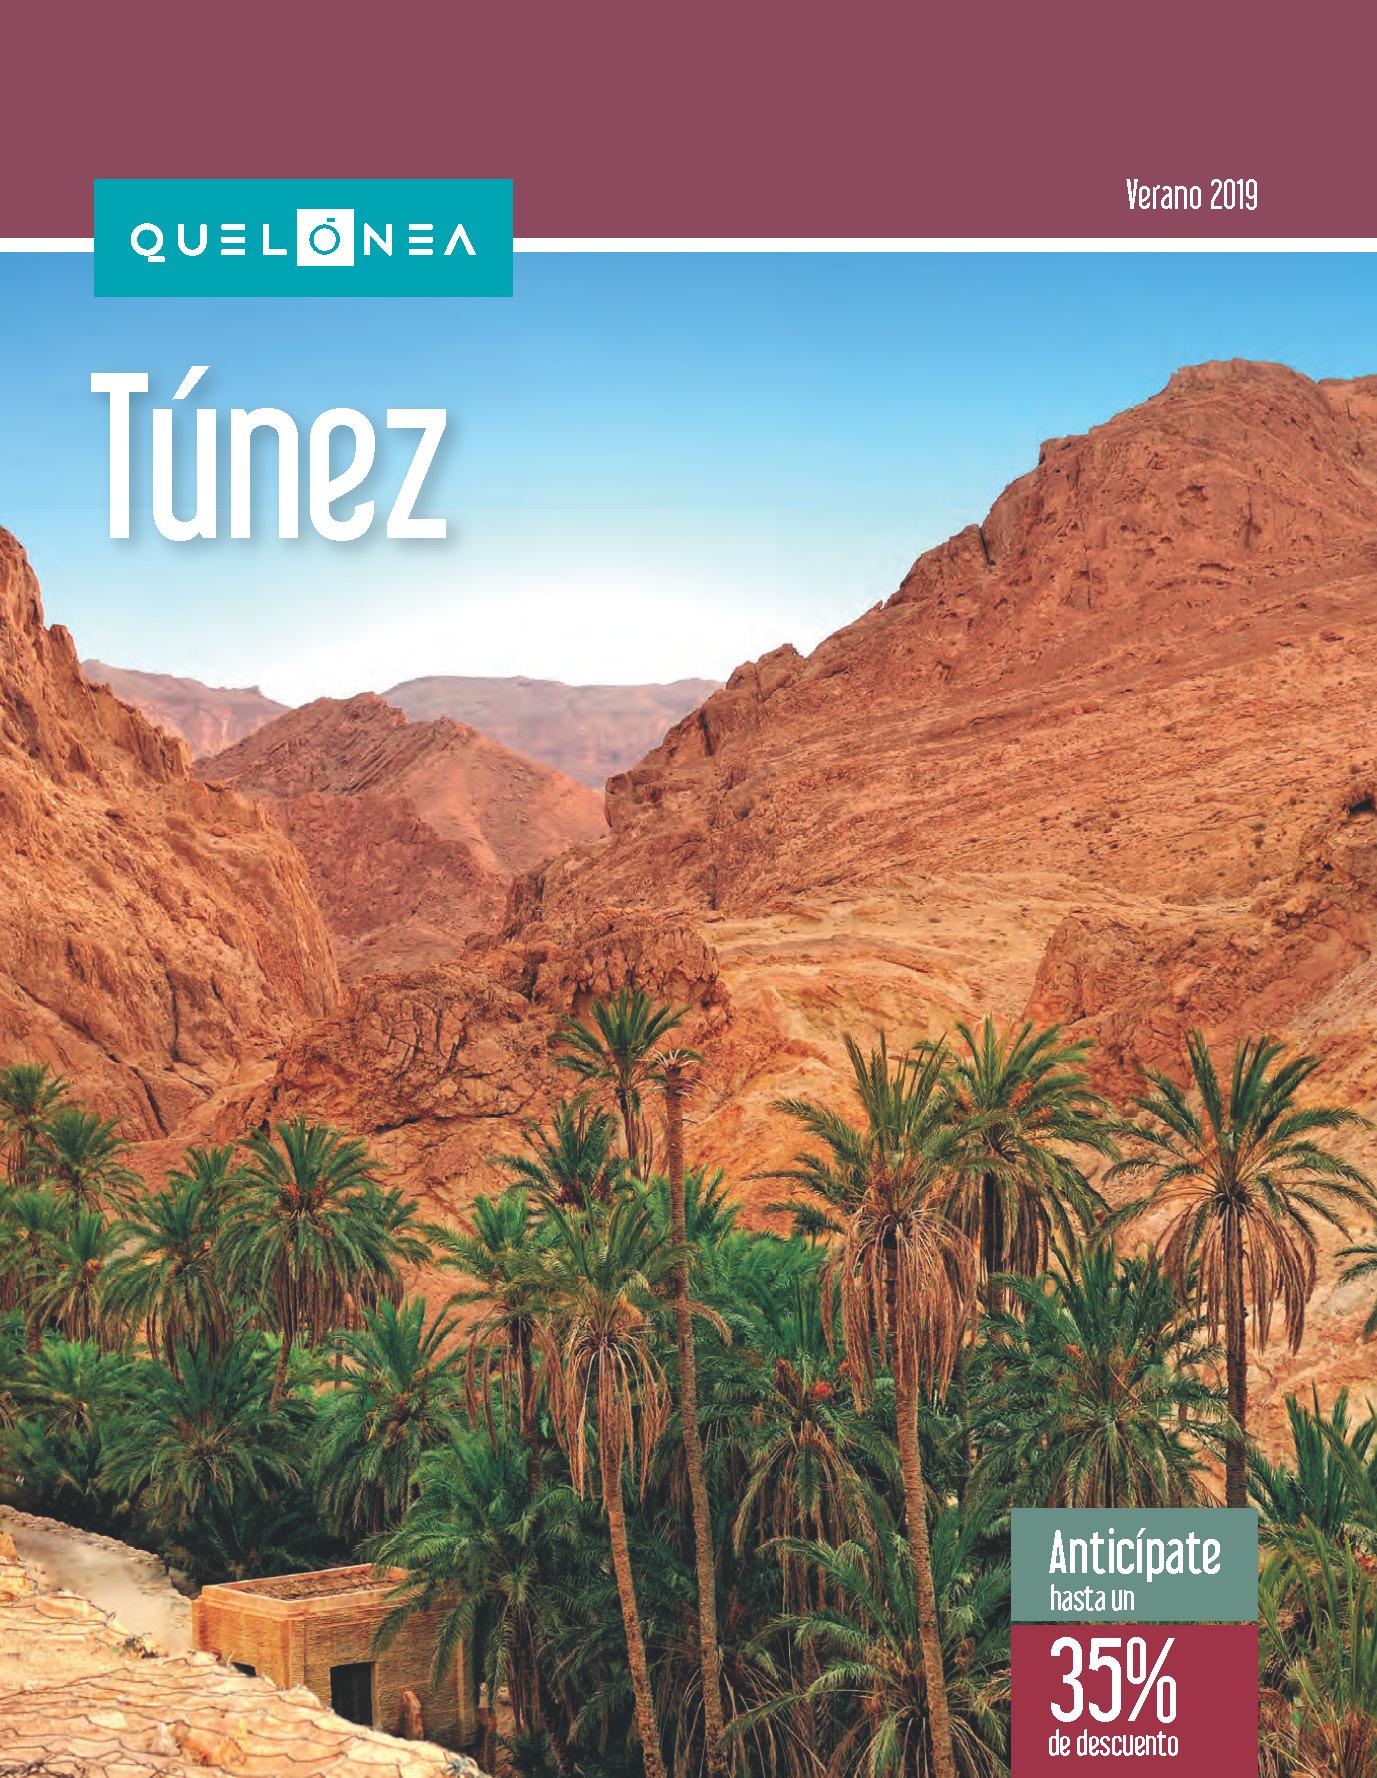 Catalogo Quelonea Tunez Verano 2019